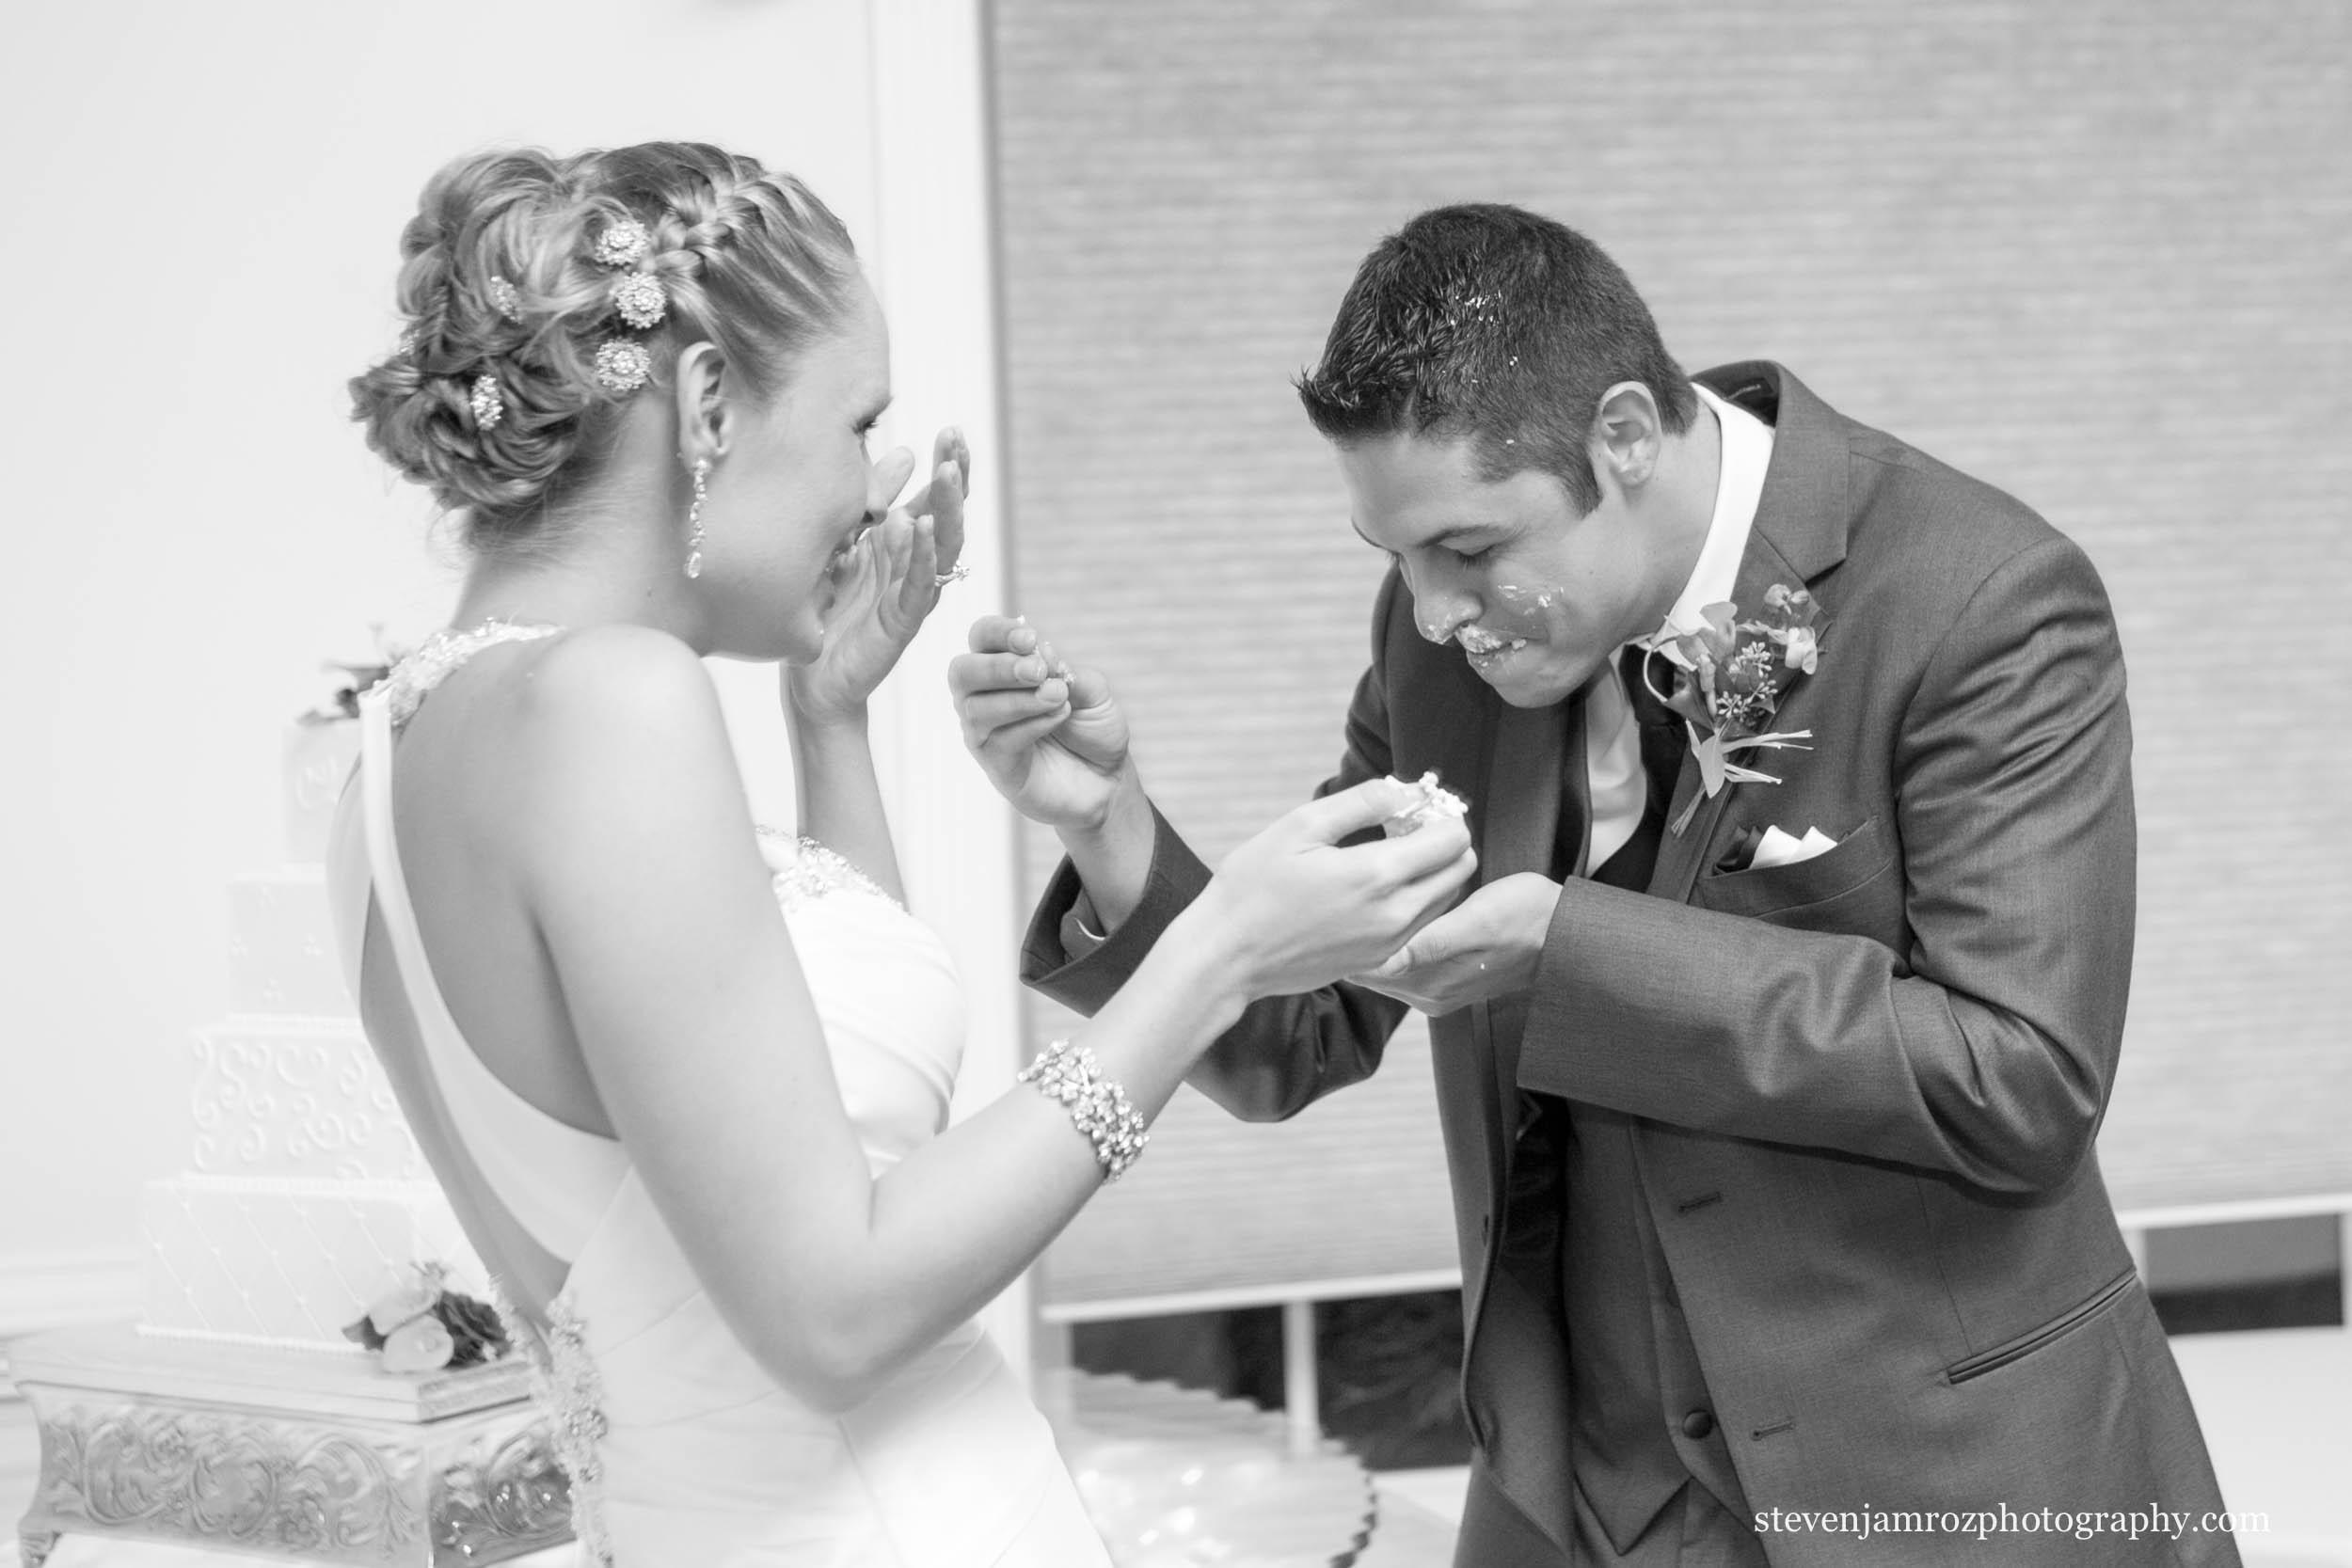 wedding-reception-venues-reviews-pricing-hudson-manor-0904.jpg